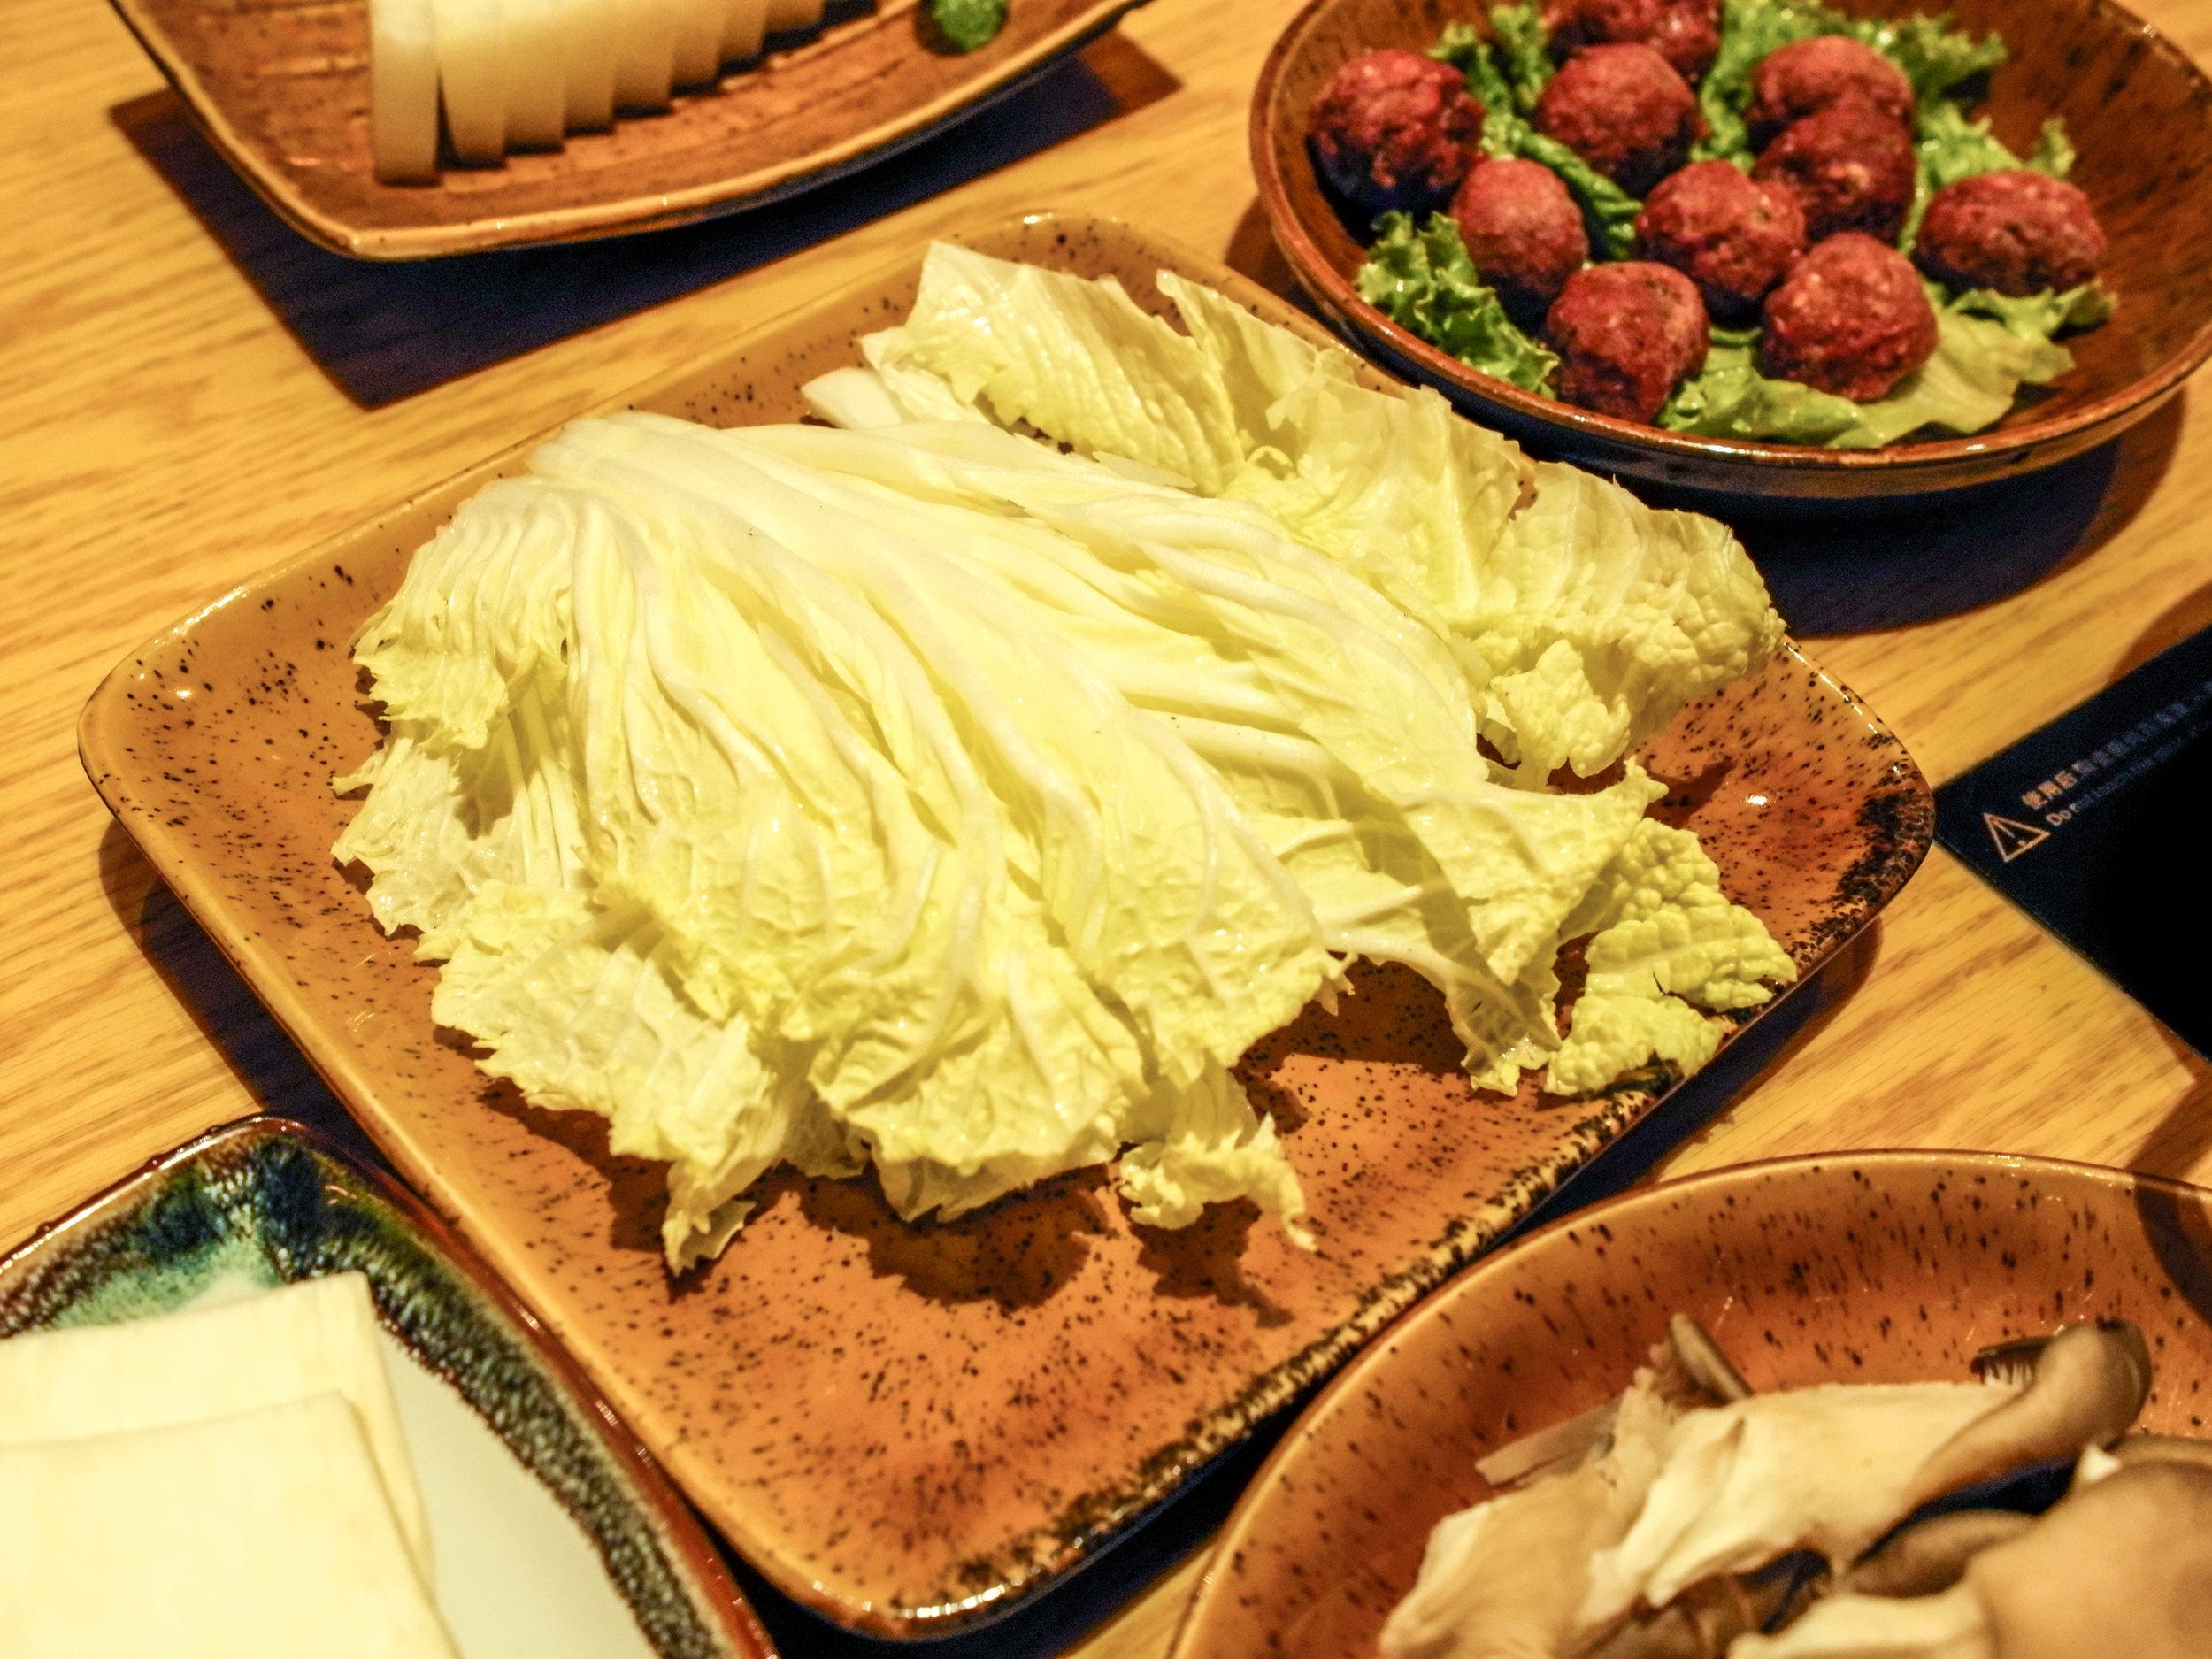 Hot Spot - napa cabbage